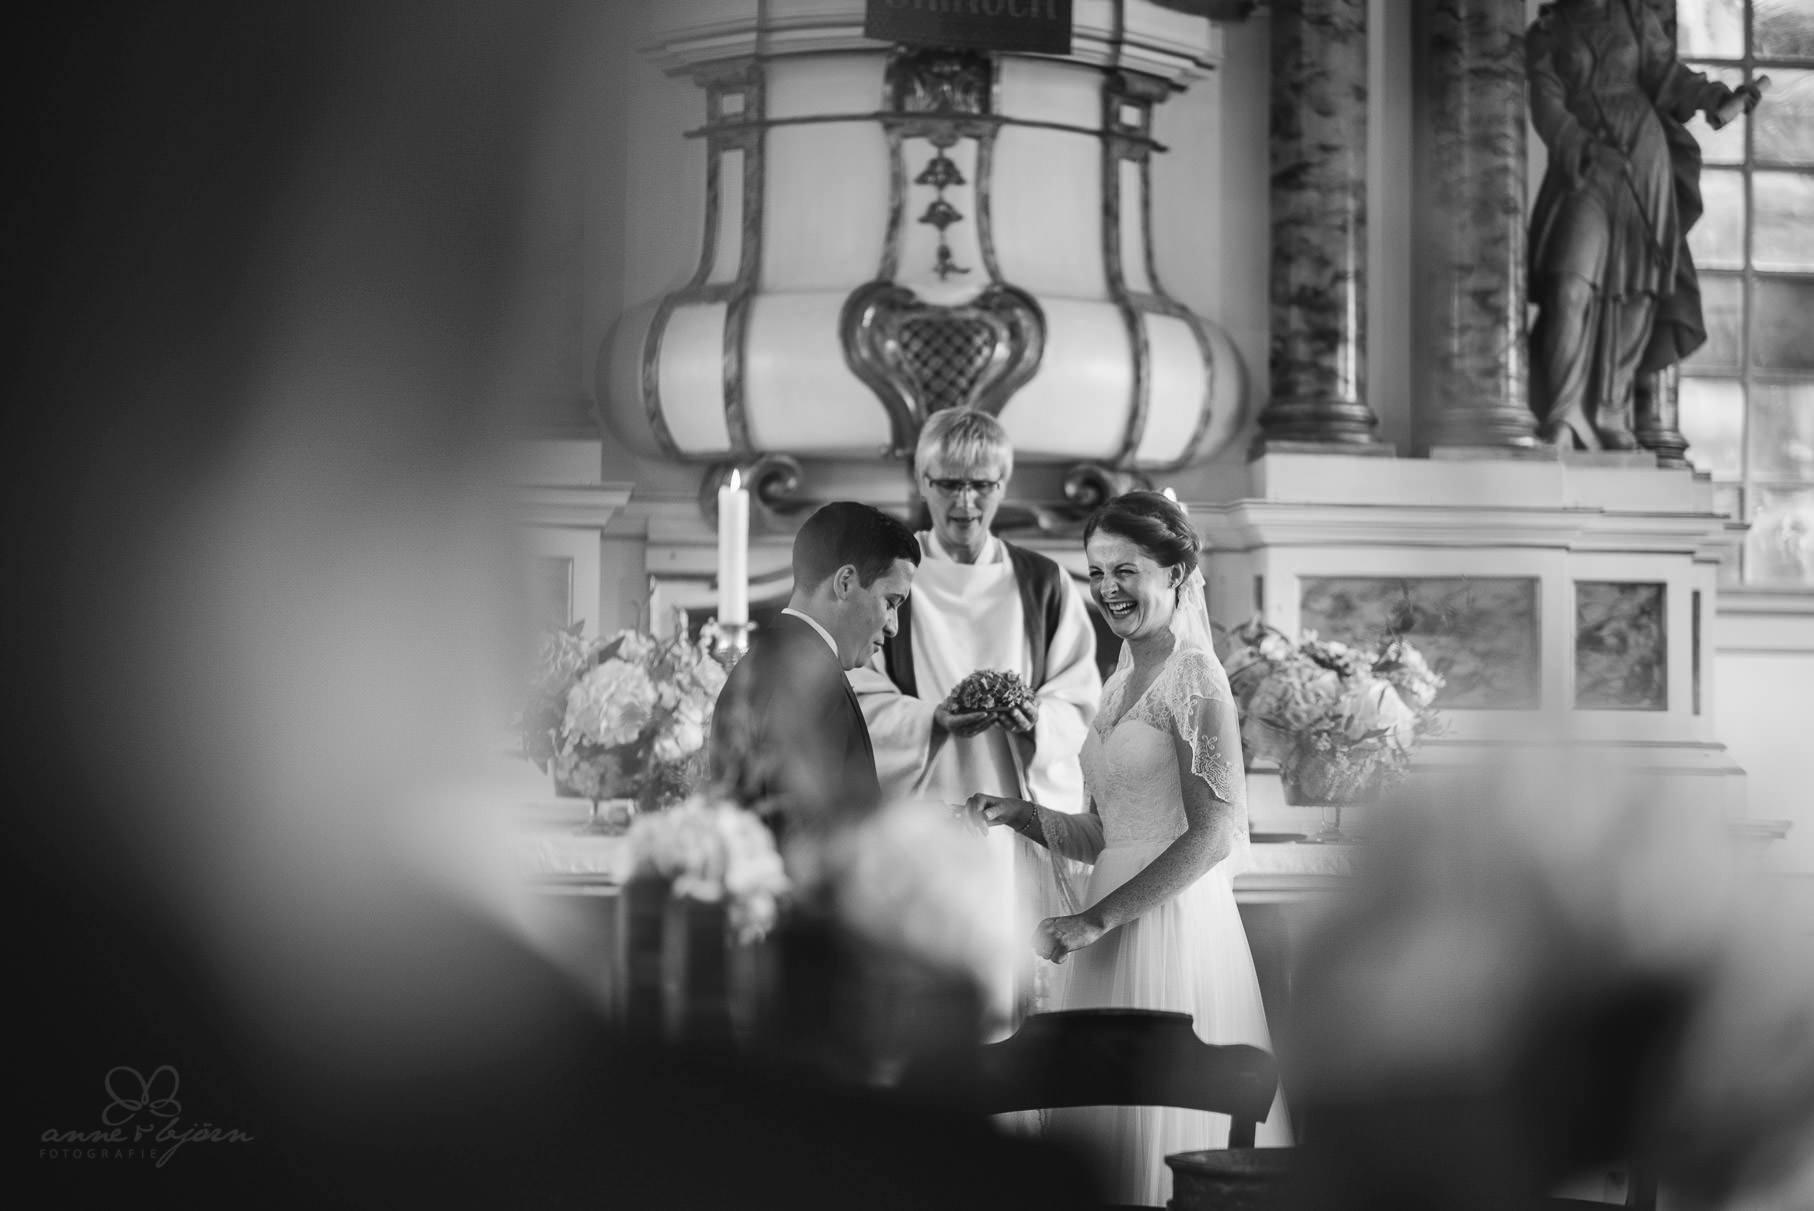 0038 aud blog 811 0146 - Hochzeit an der Hamburger Elbe - Ann-Katrin & Daniel